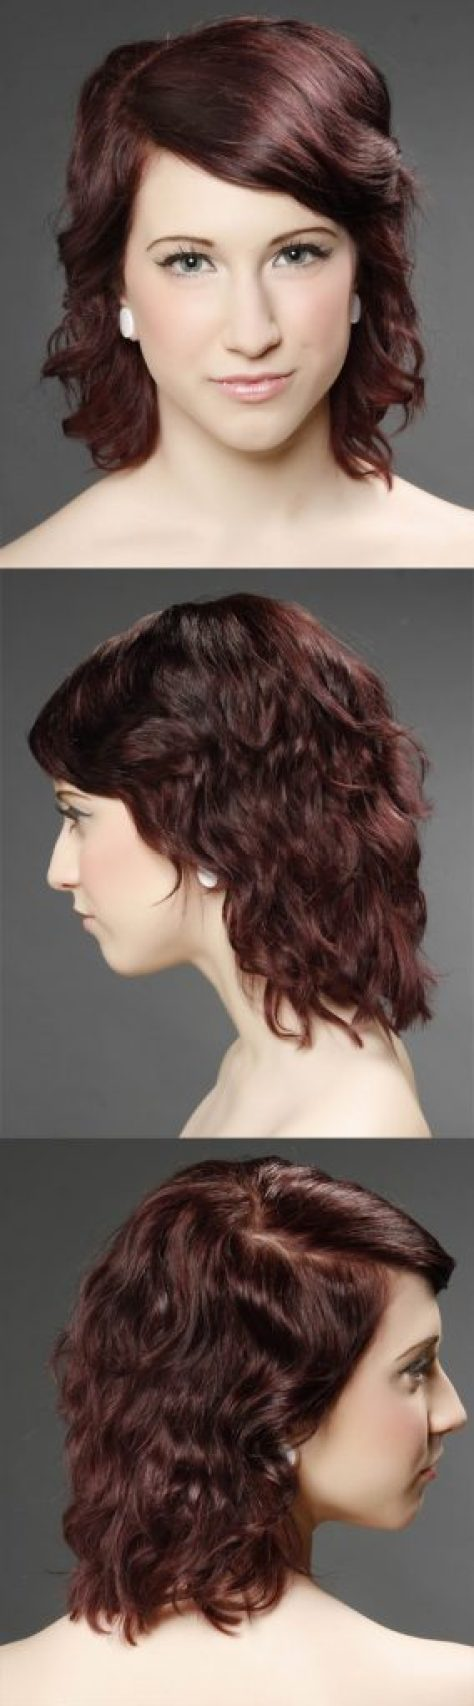 Medium Wavy Burgundy Hair with Side Swept Bangs